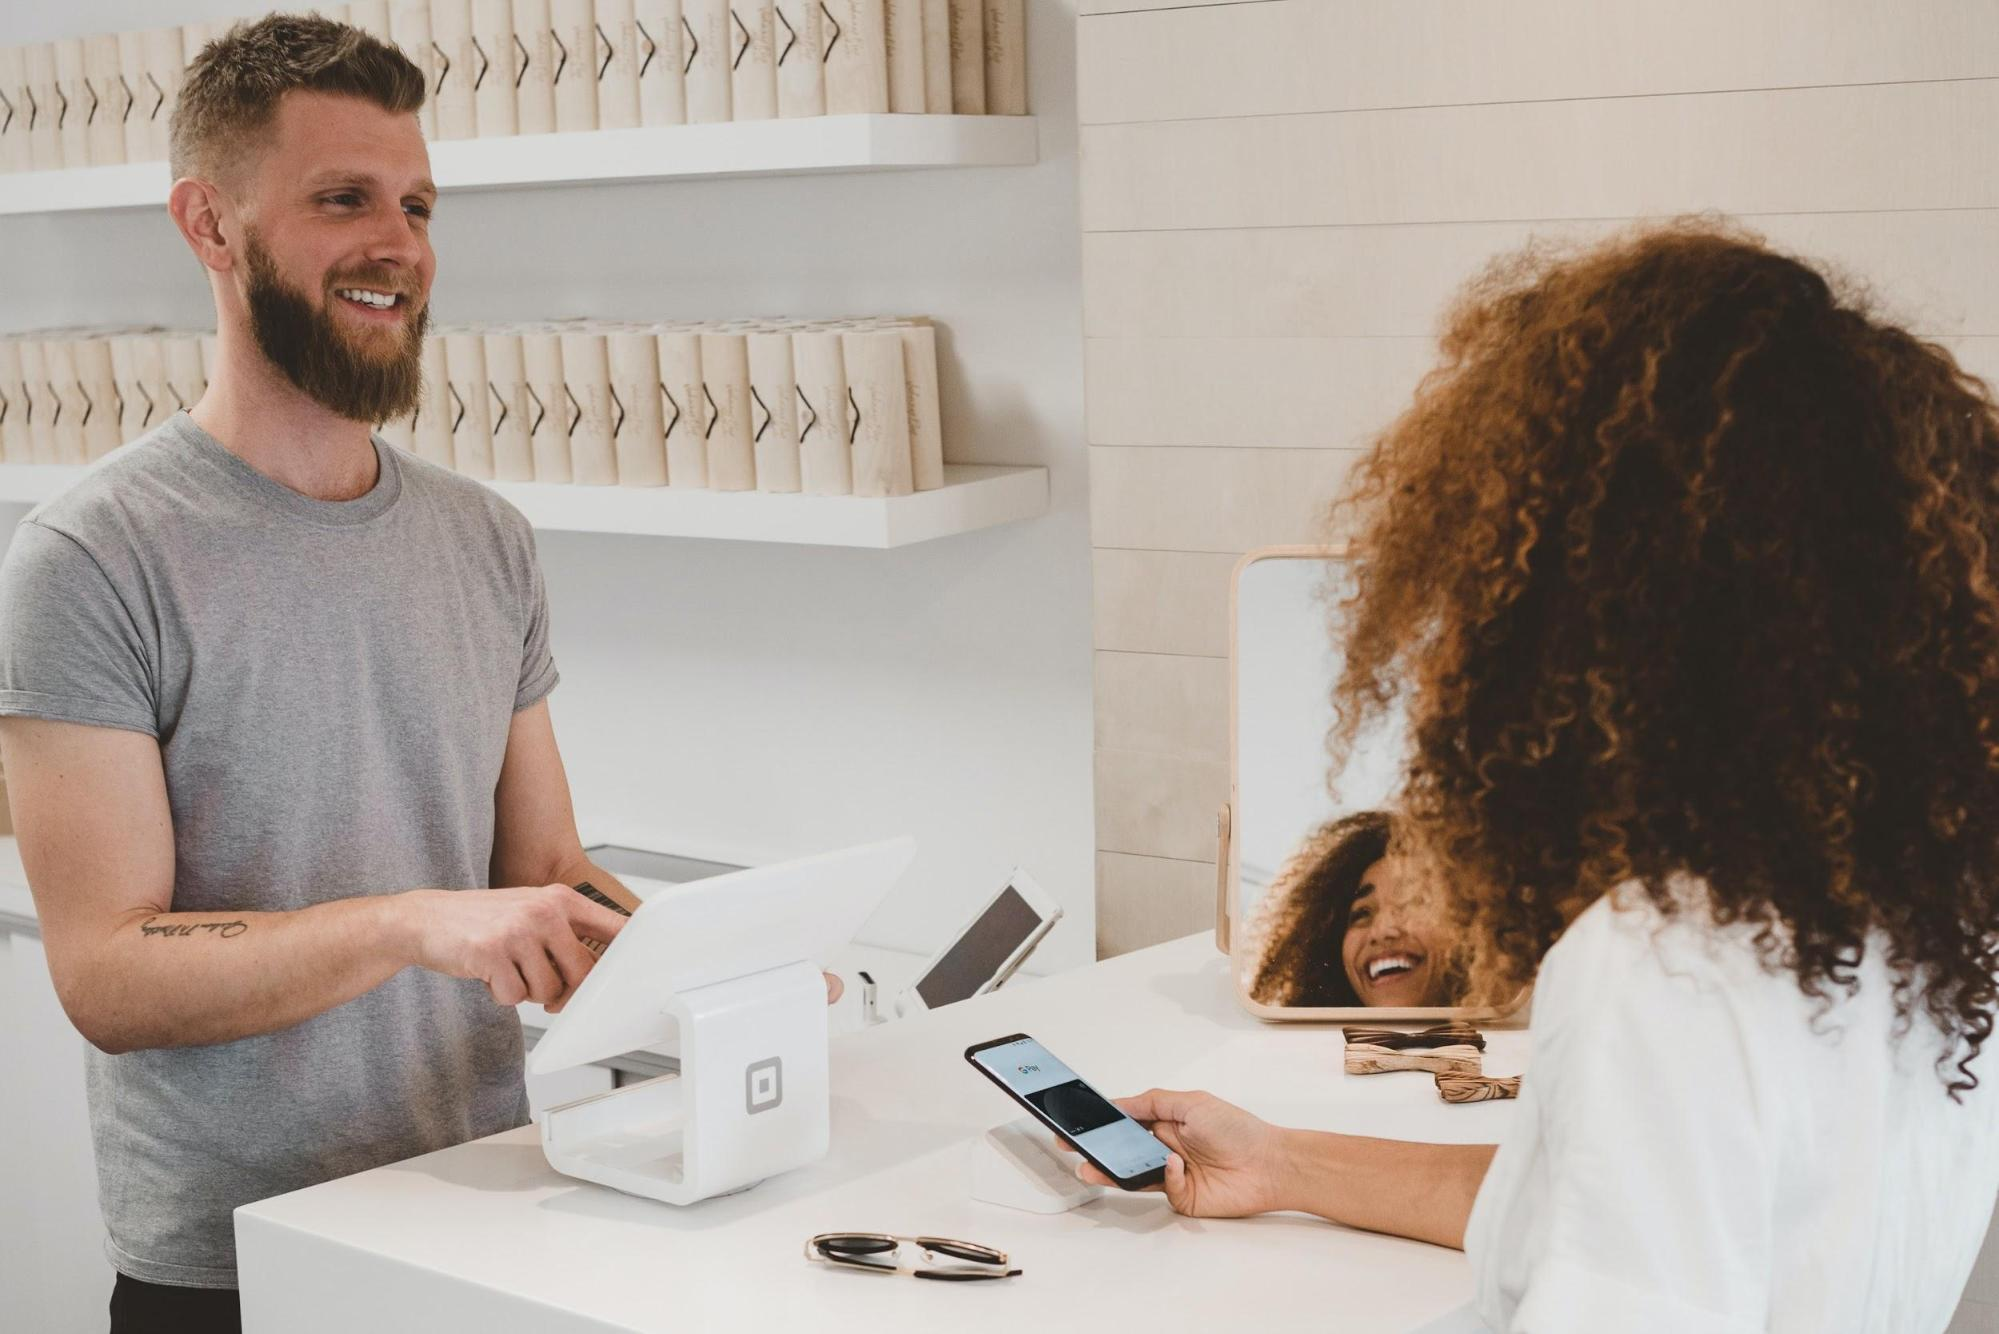 Friendly customer service interaction